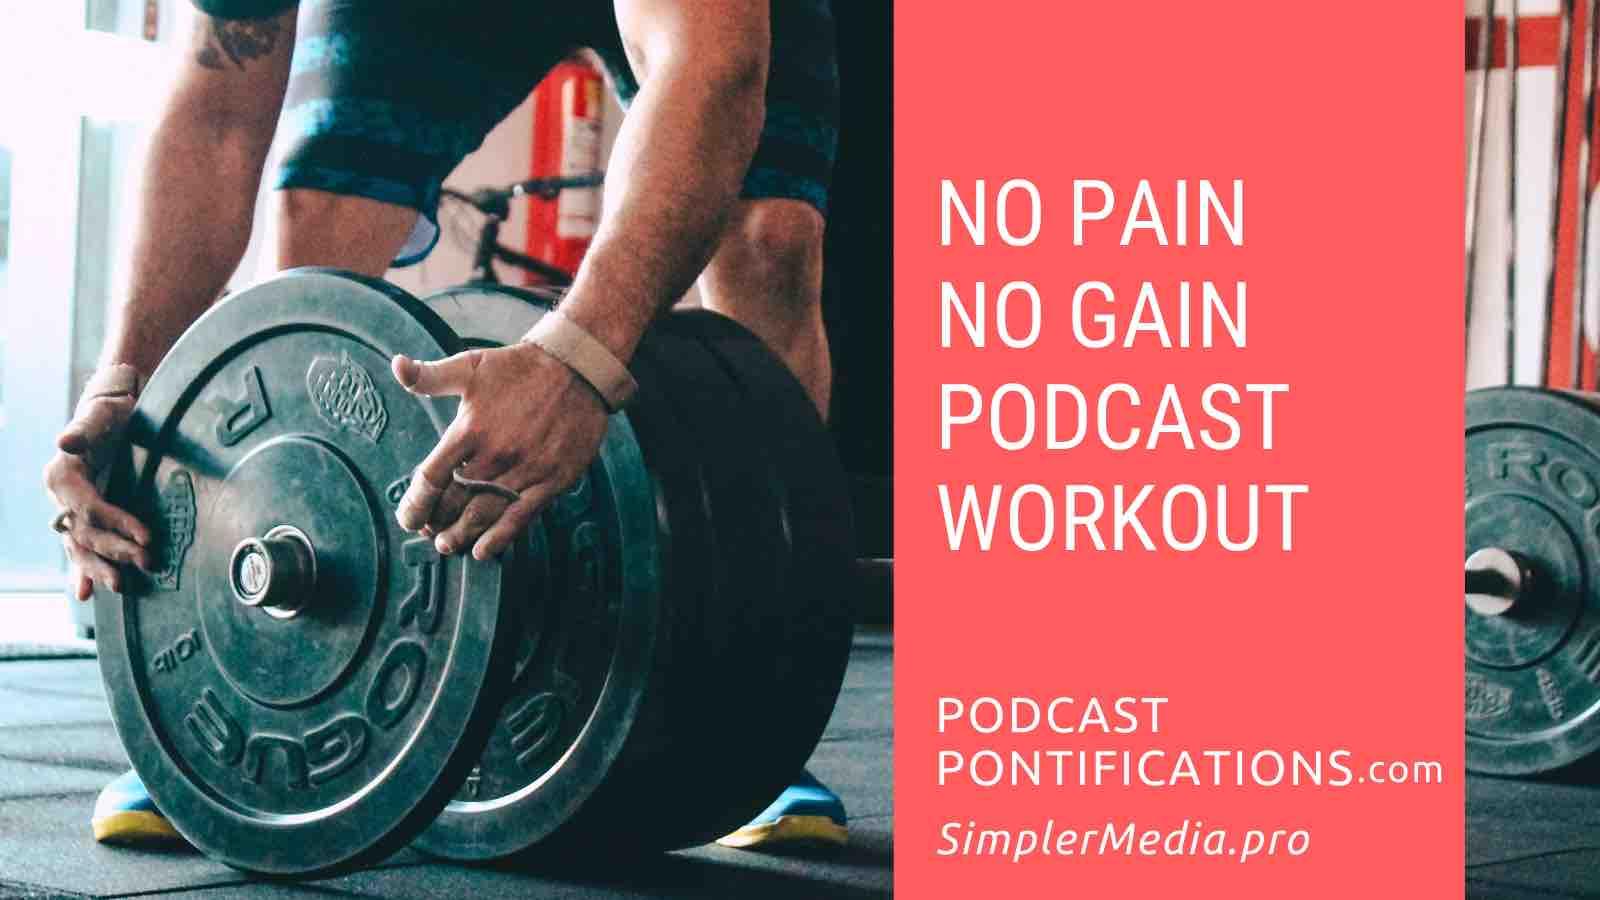 No Pain No Gain Podcast Workout